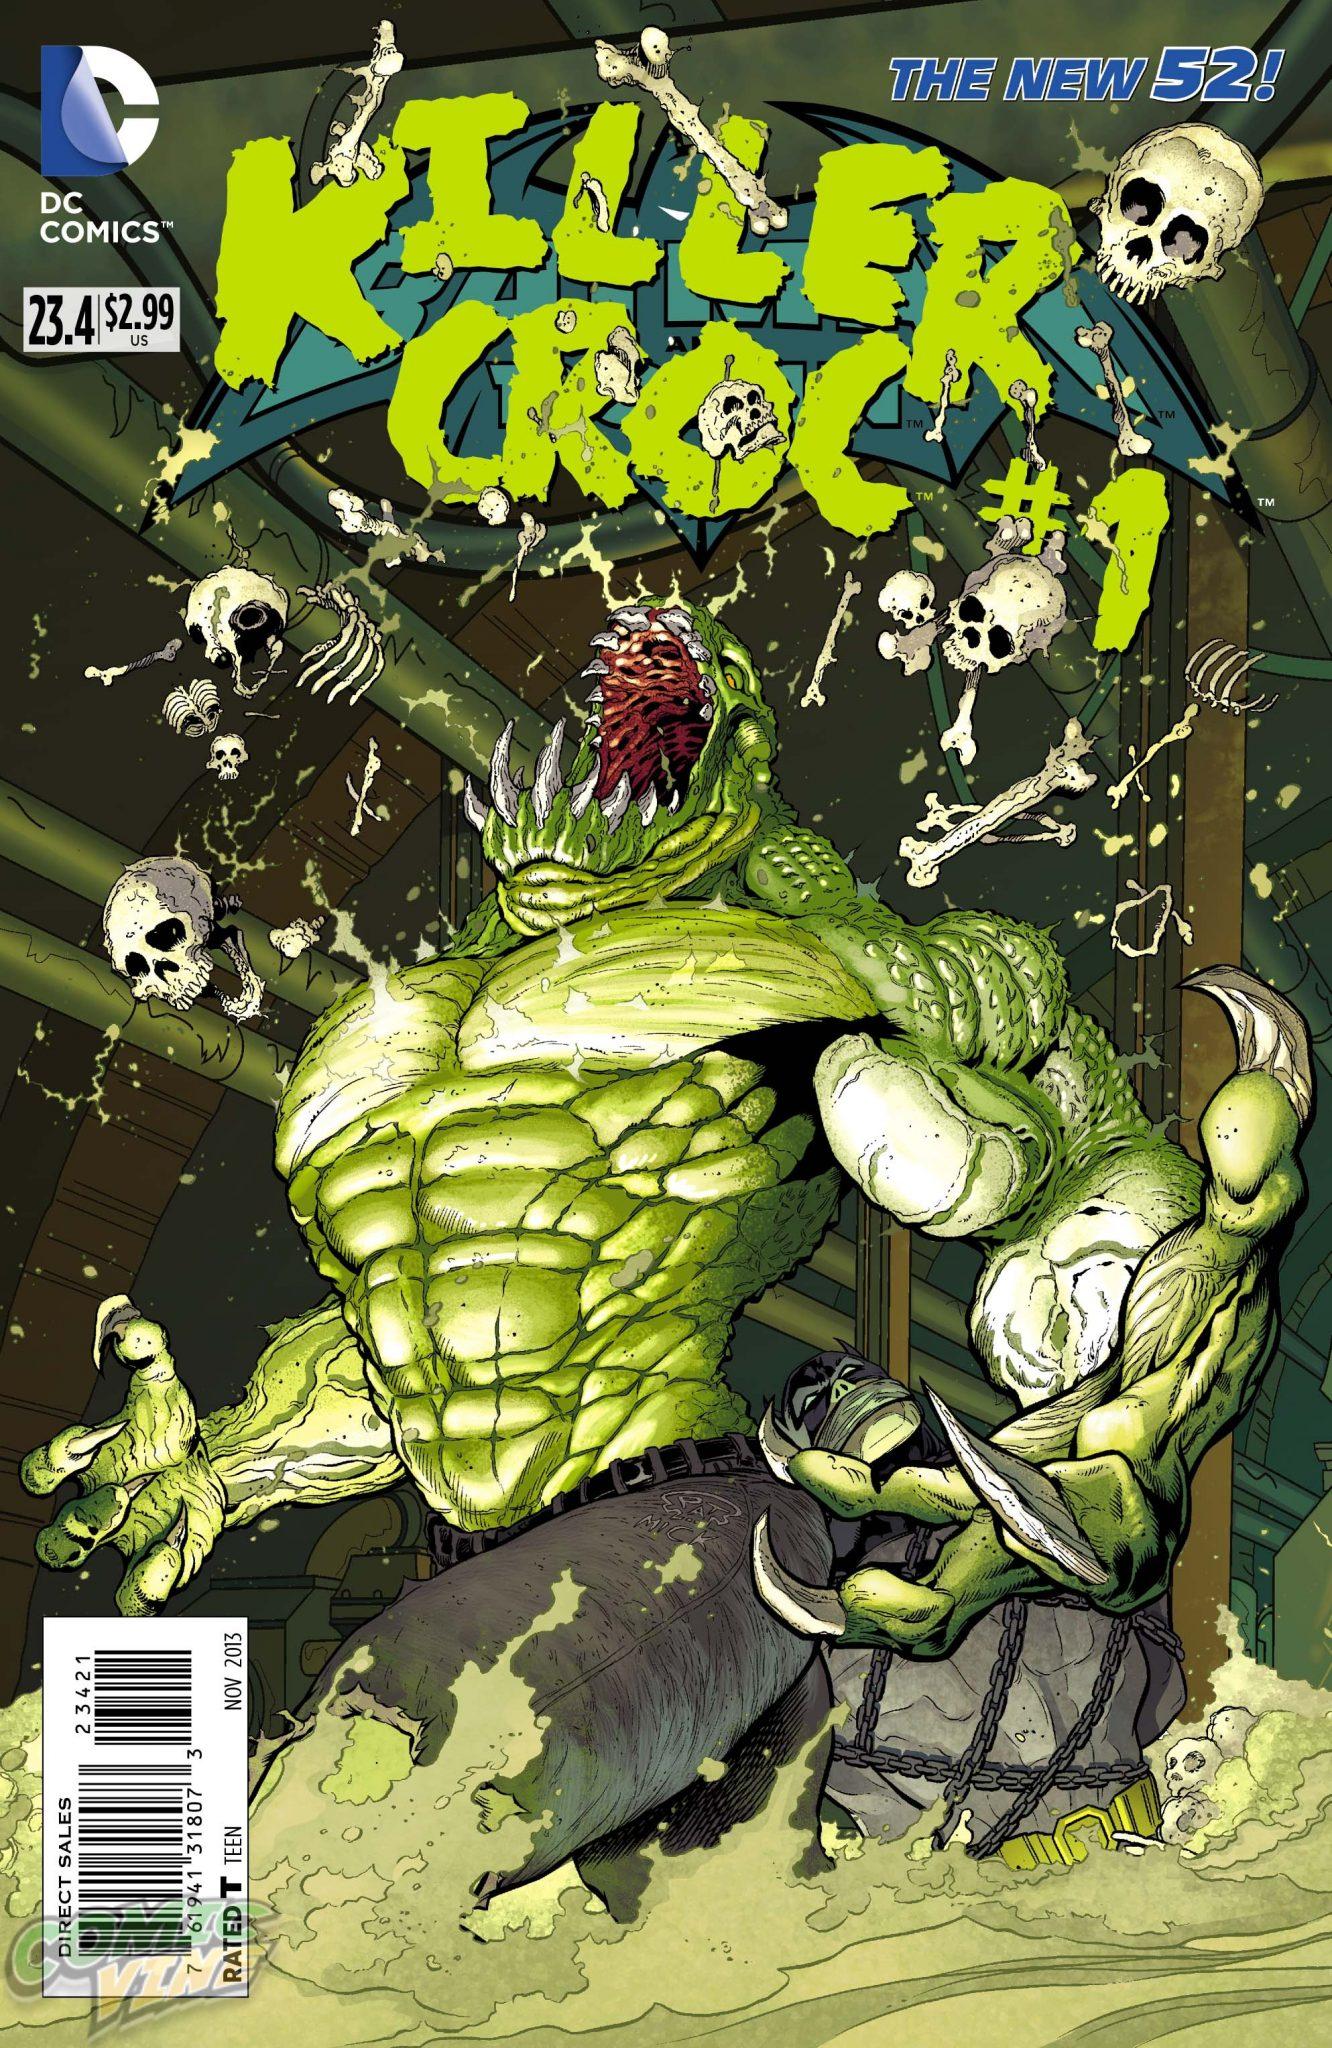 Killer Croc cast in Suicide Squad